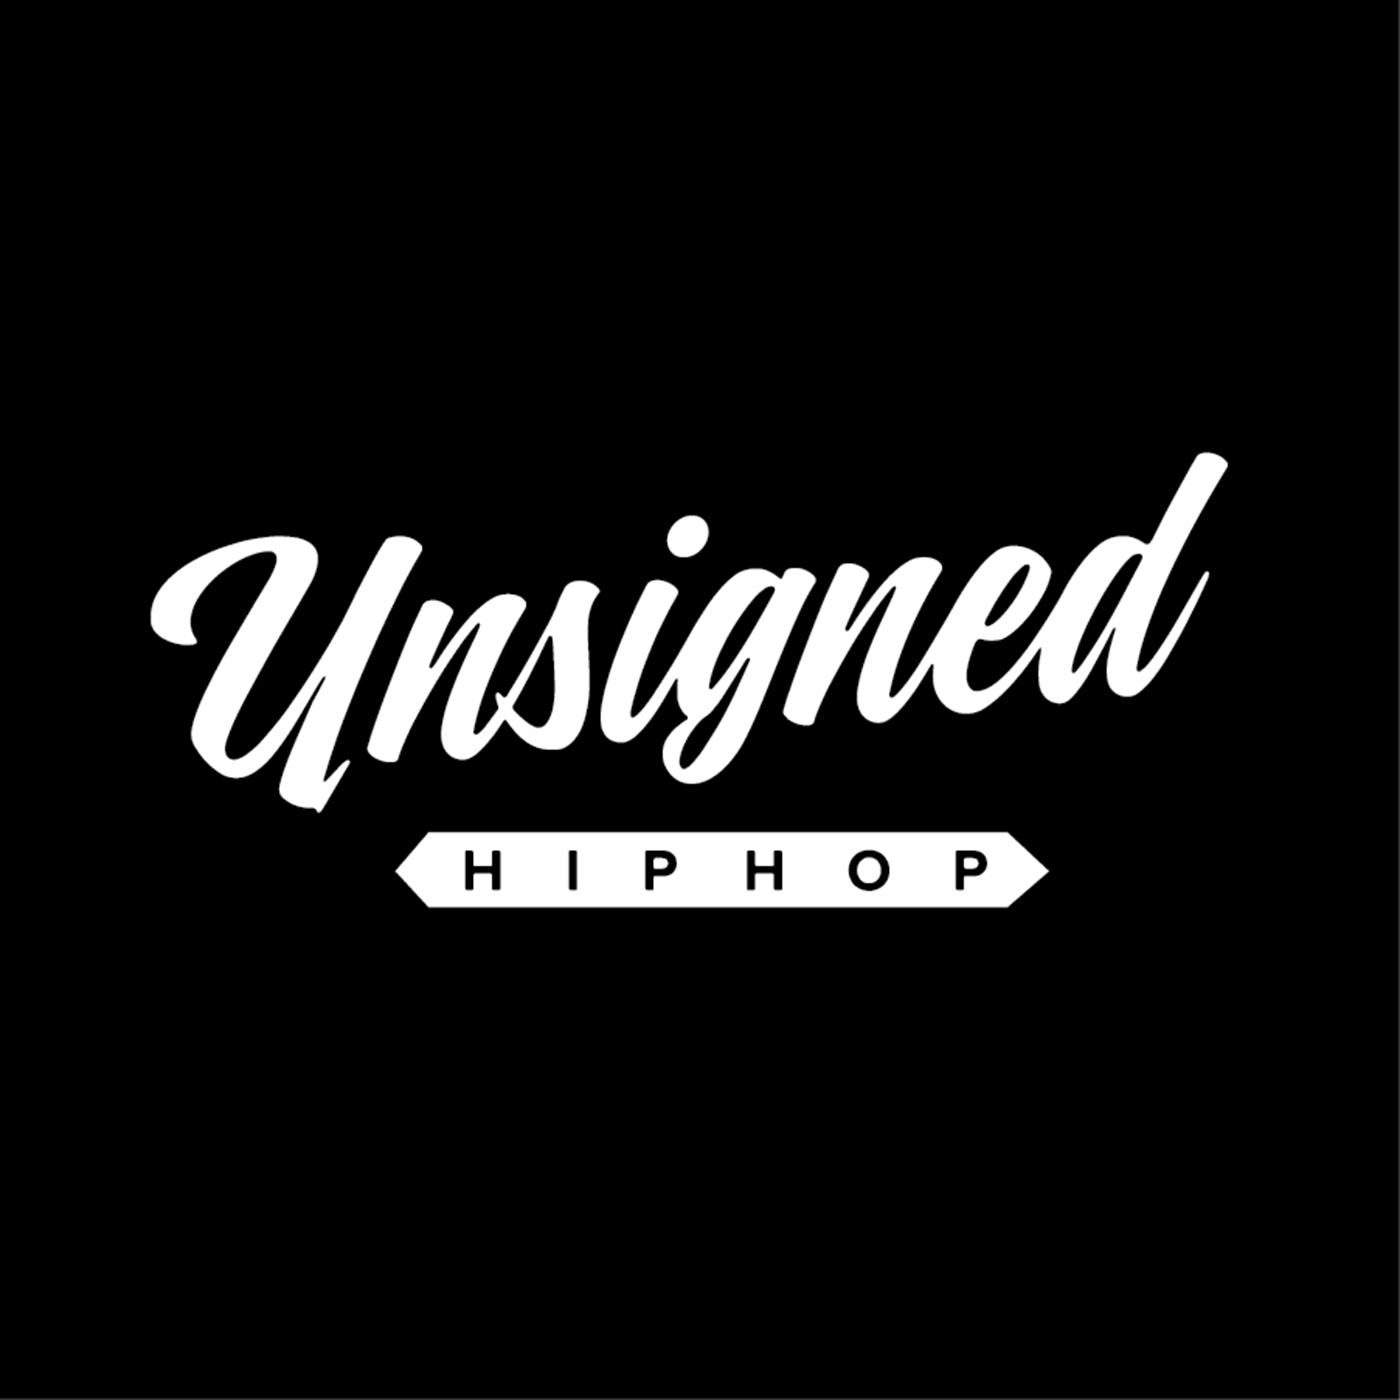 Unsigned Hip Hop show art